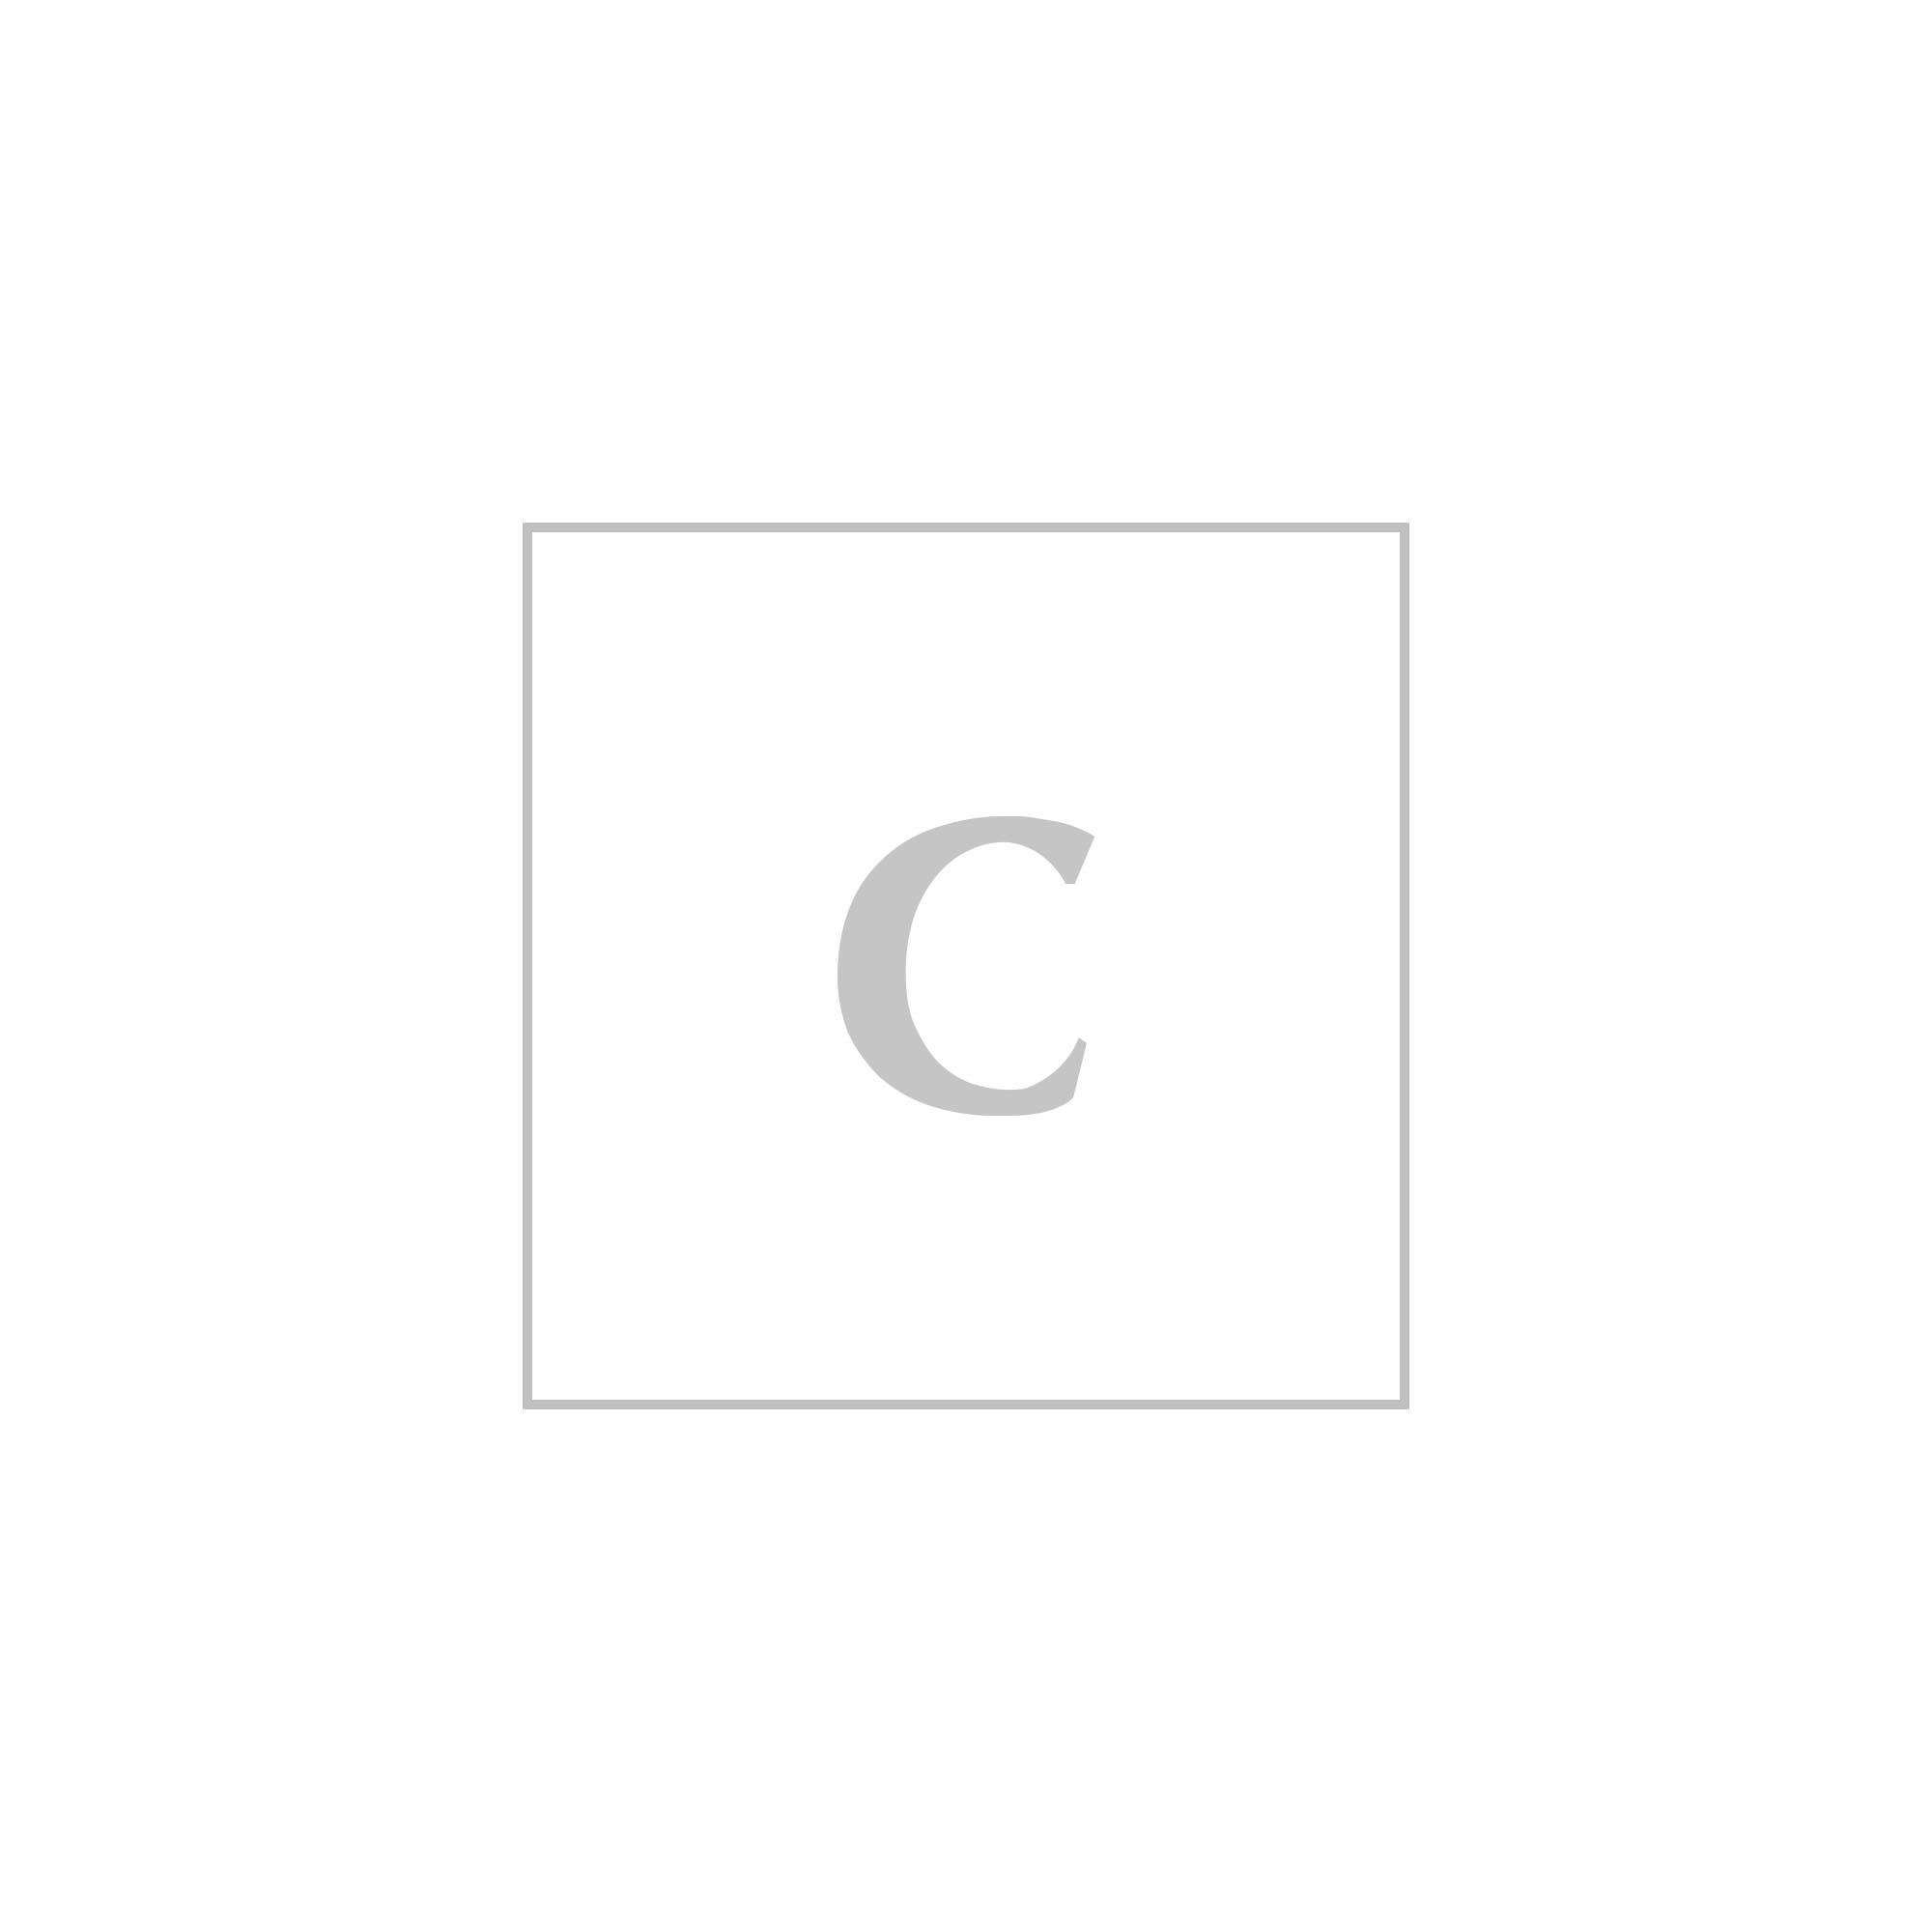 saint laurent abbigliamento donna t-shirt con stampa logo